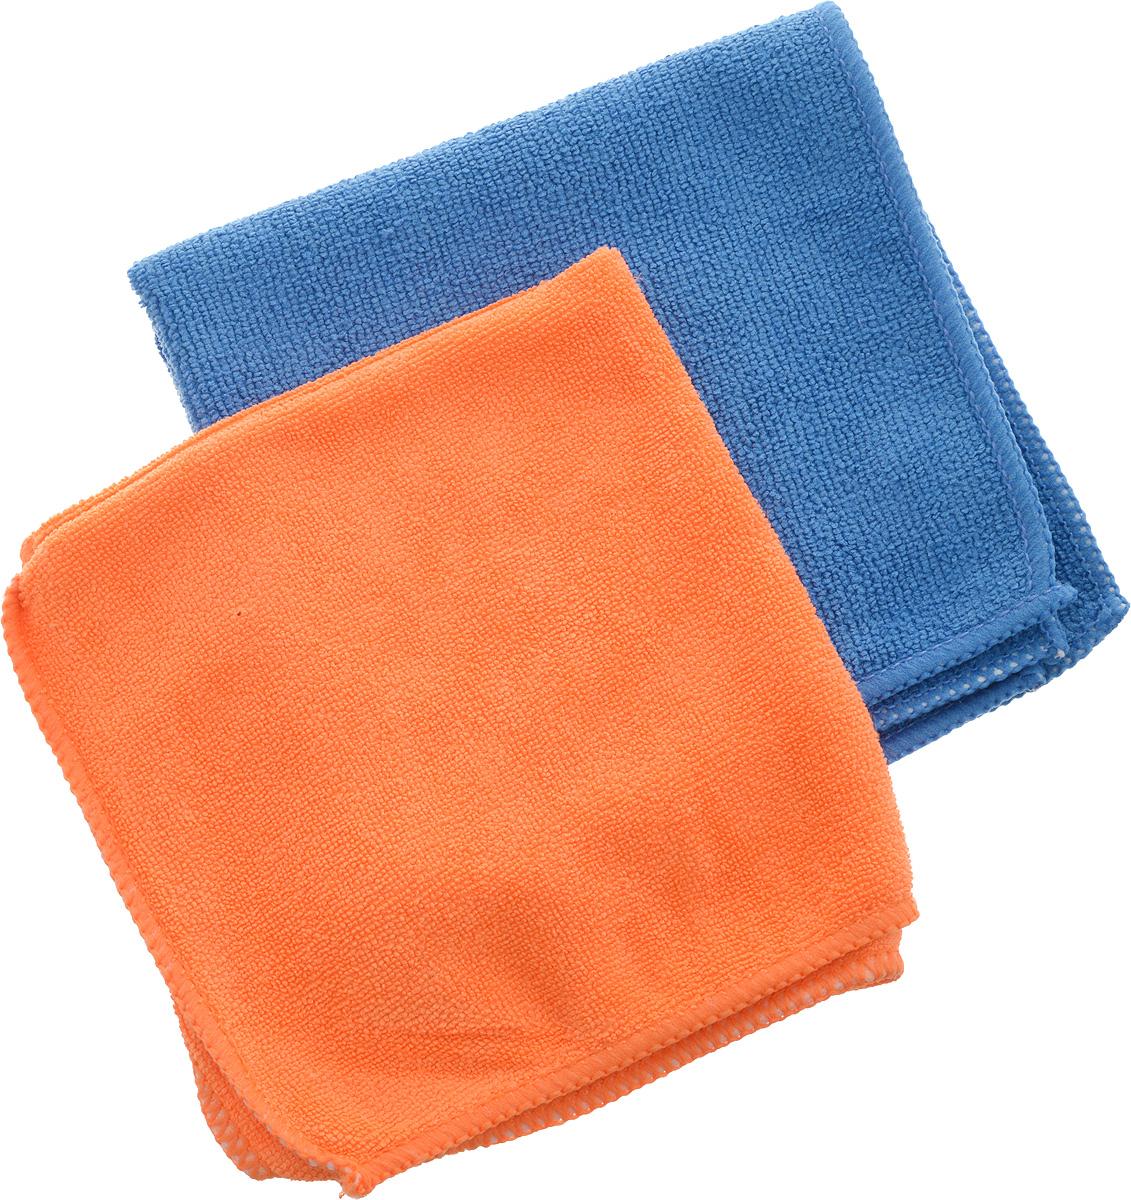 Набор салфеток из микрофибры Airline, цвет: синий, оранжевый, 30 х  см, 2 шт